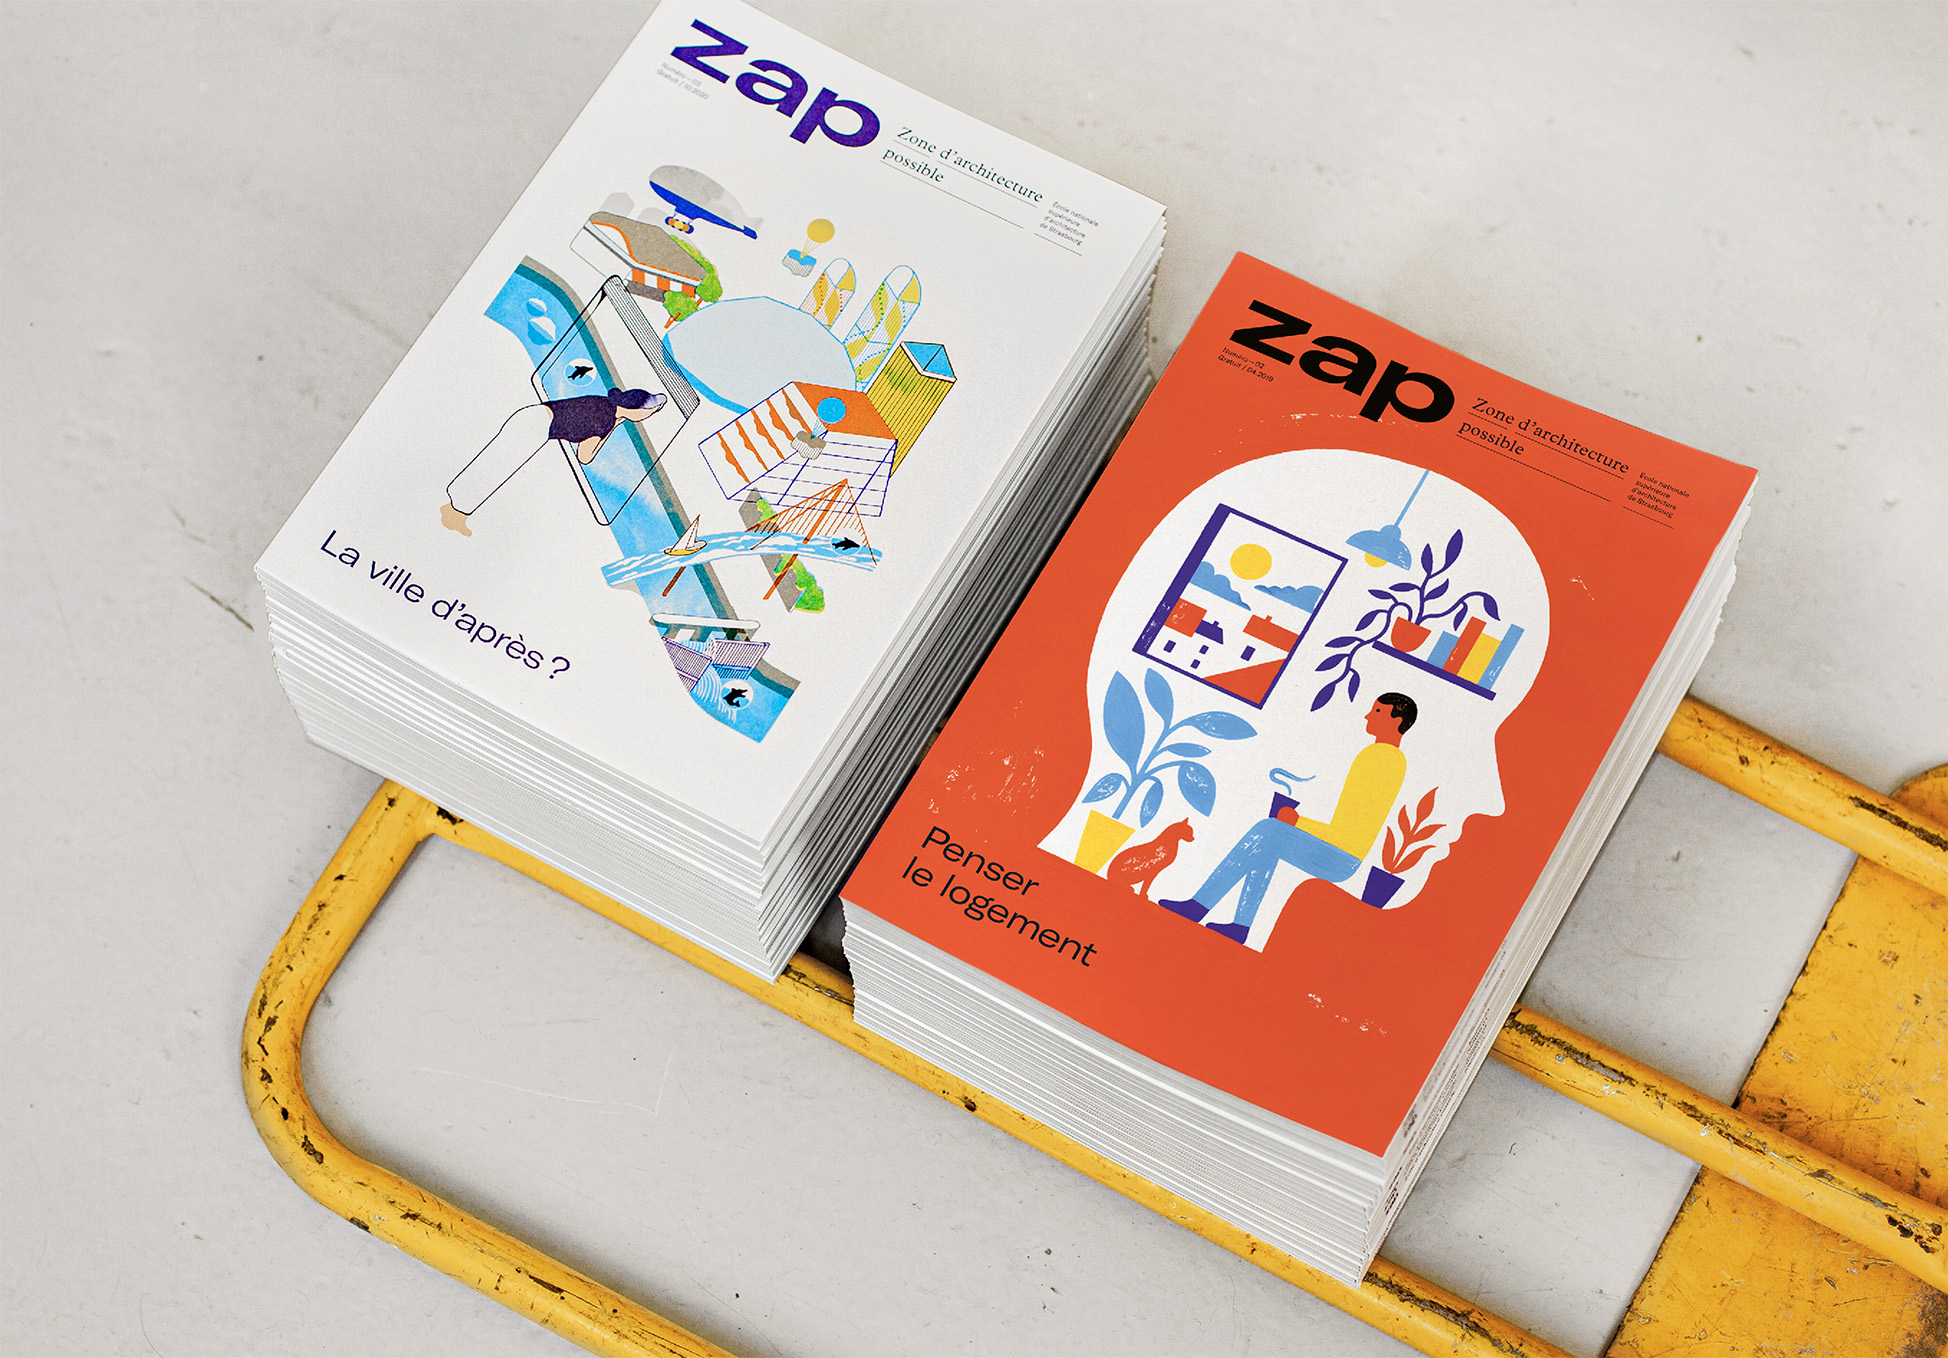 zap_magazine_01